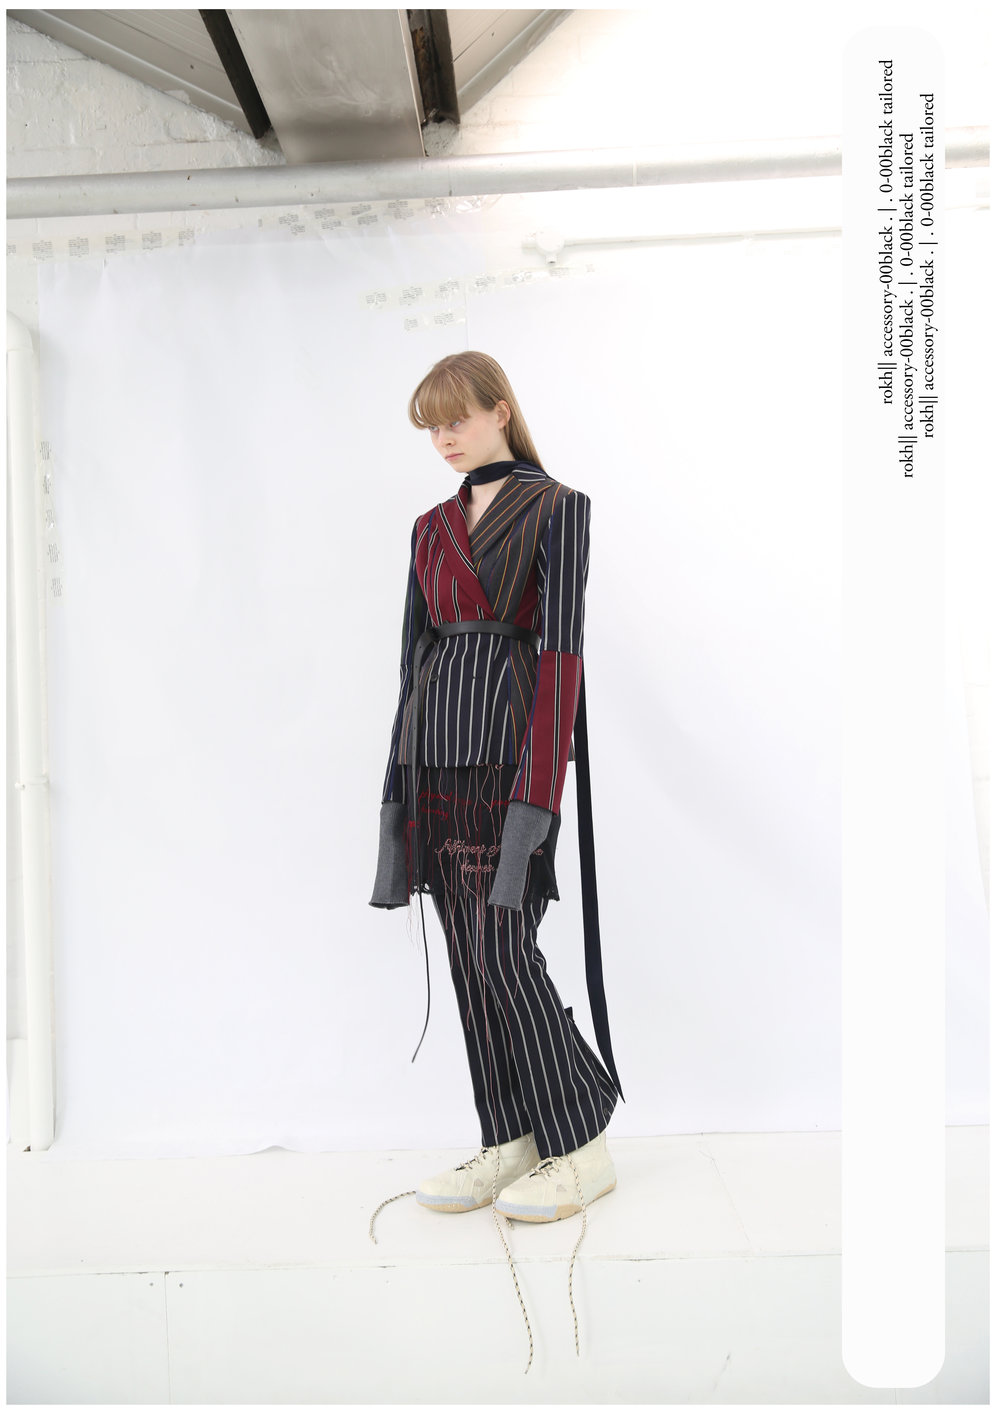 rokh_ss18_fashion_magazine_12a.jpg